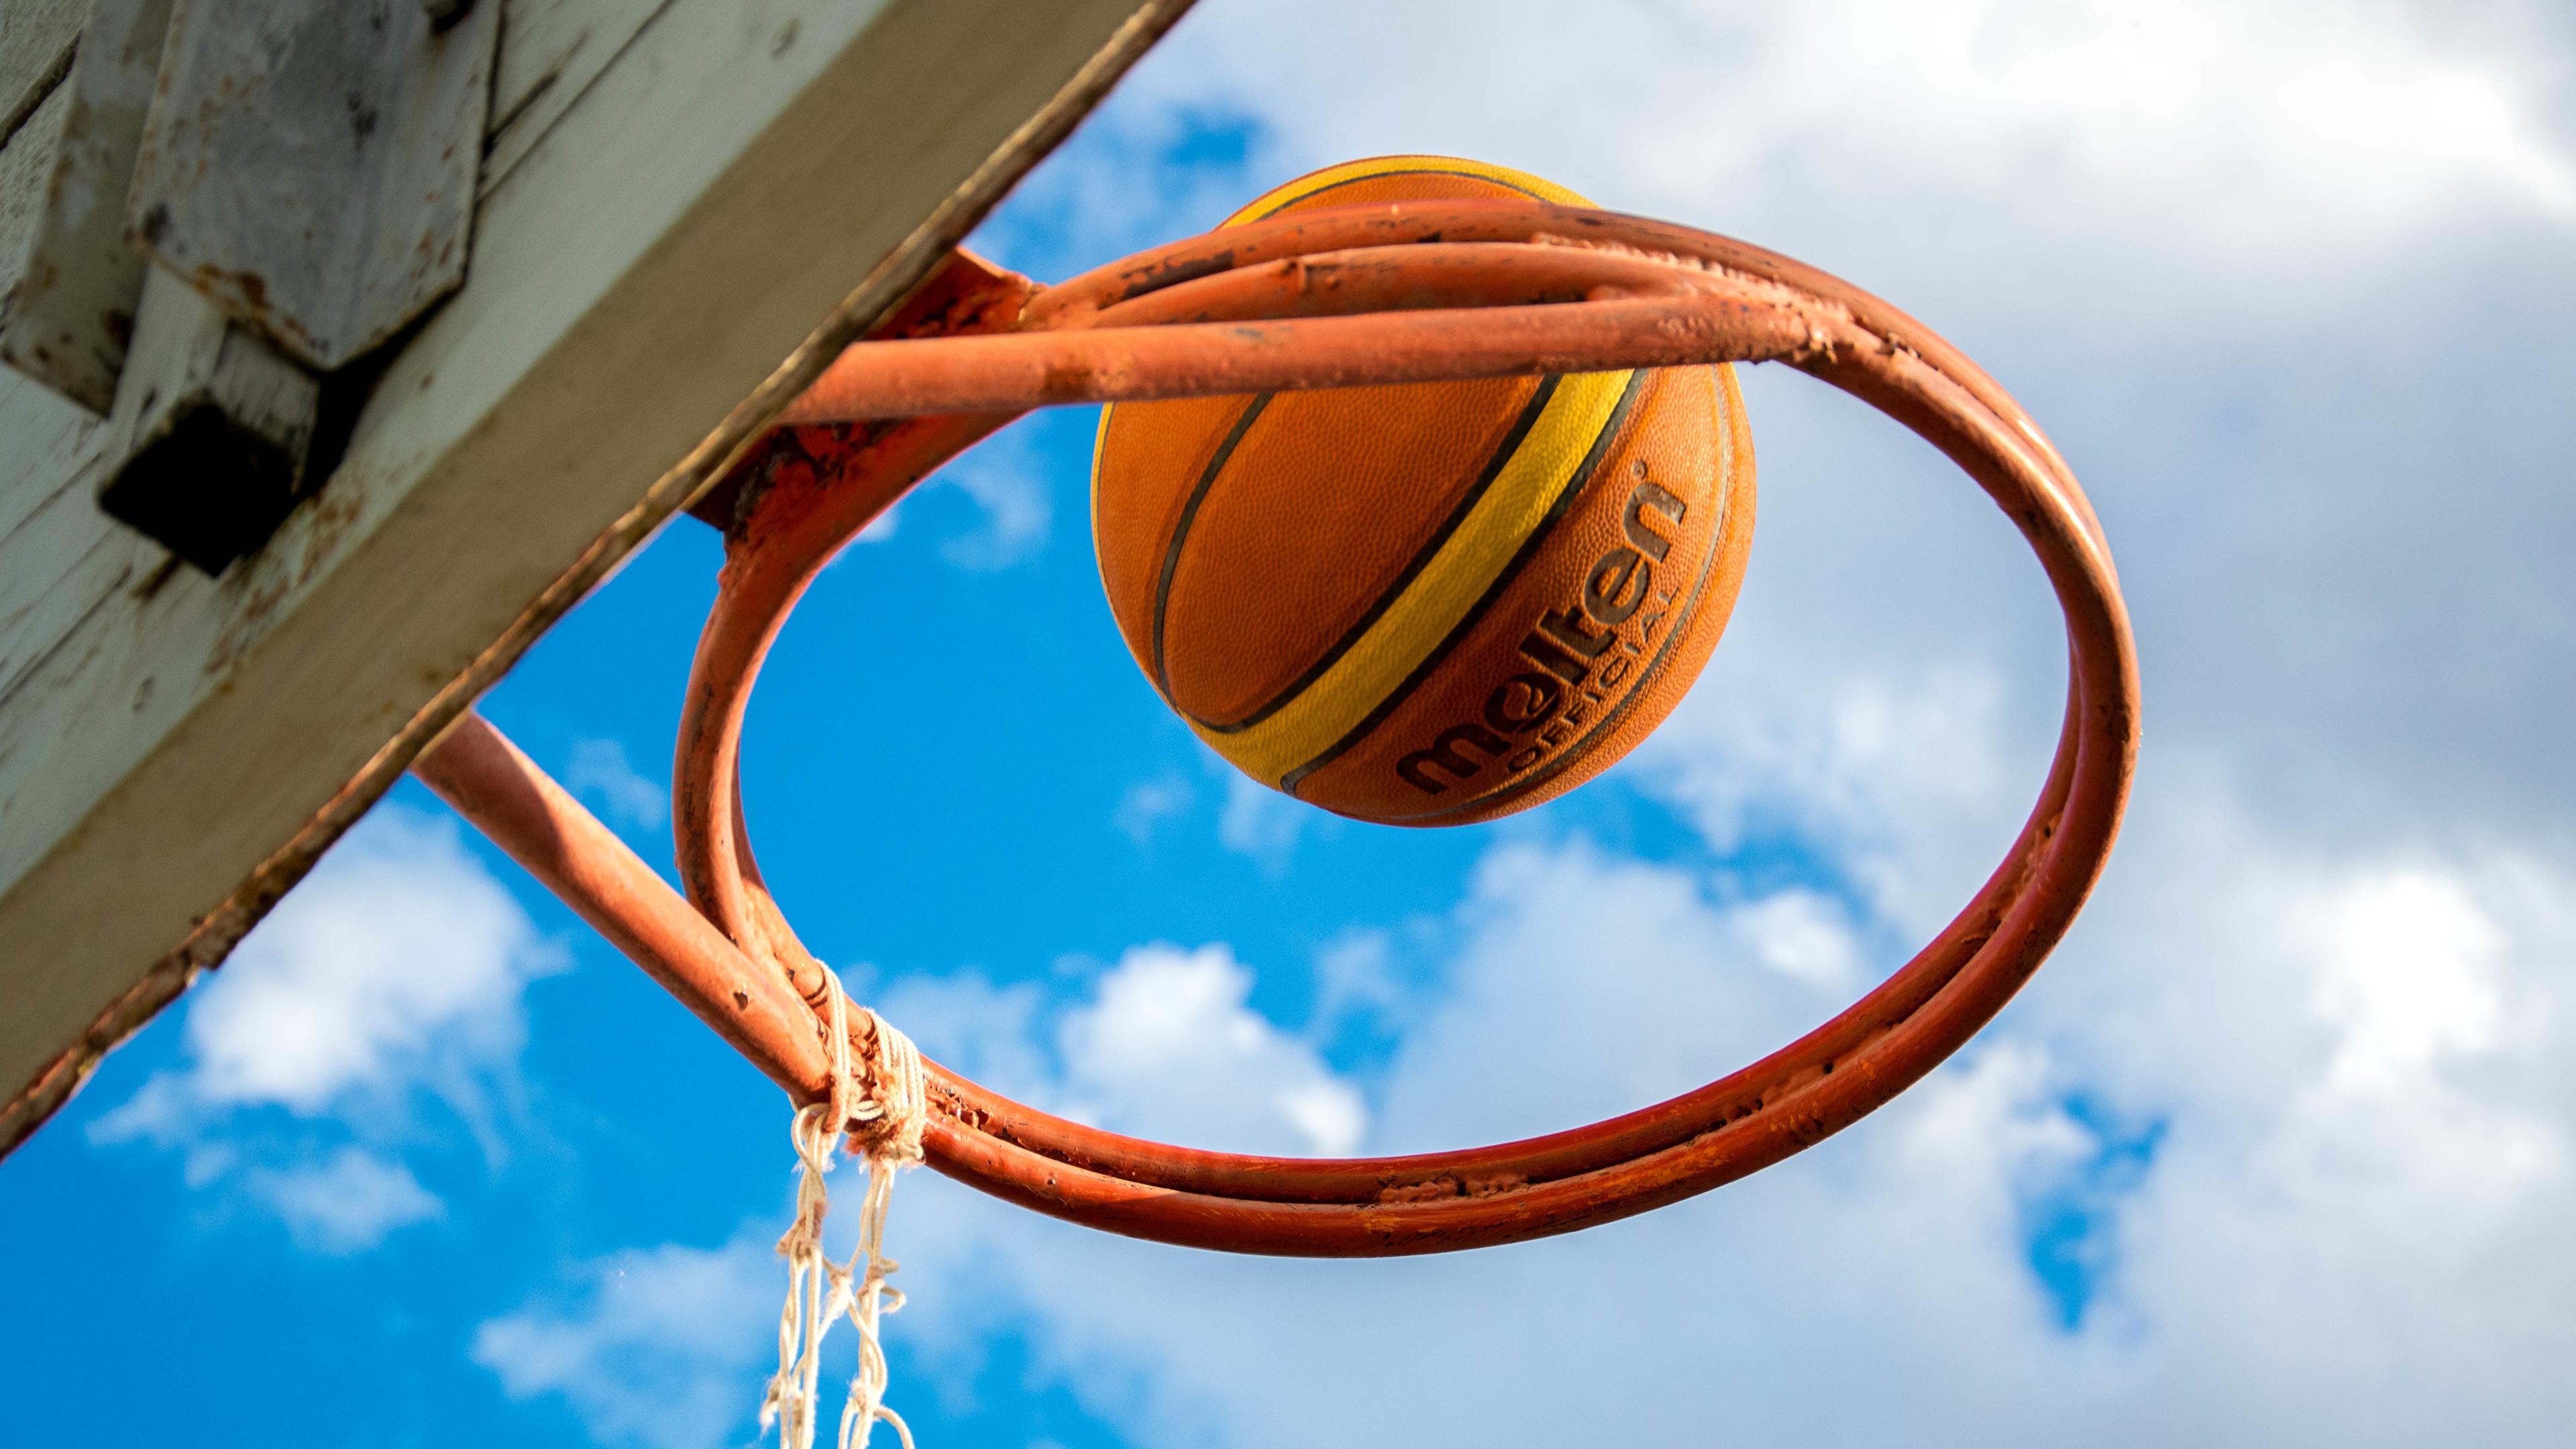 Баскетбол кольцо мячь смотреть